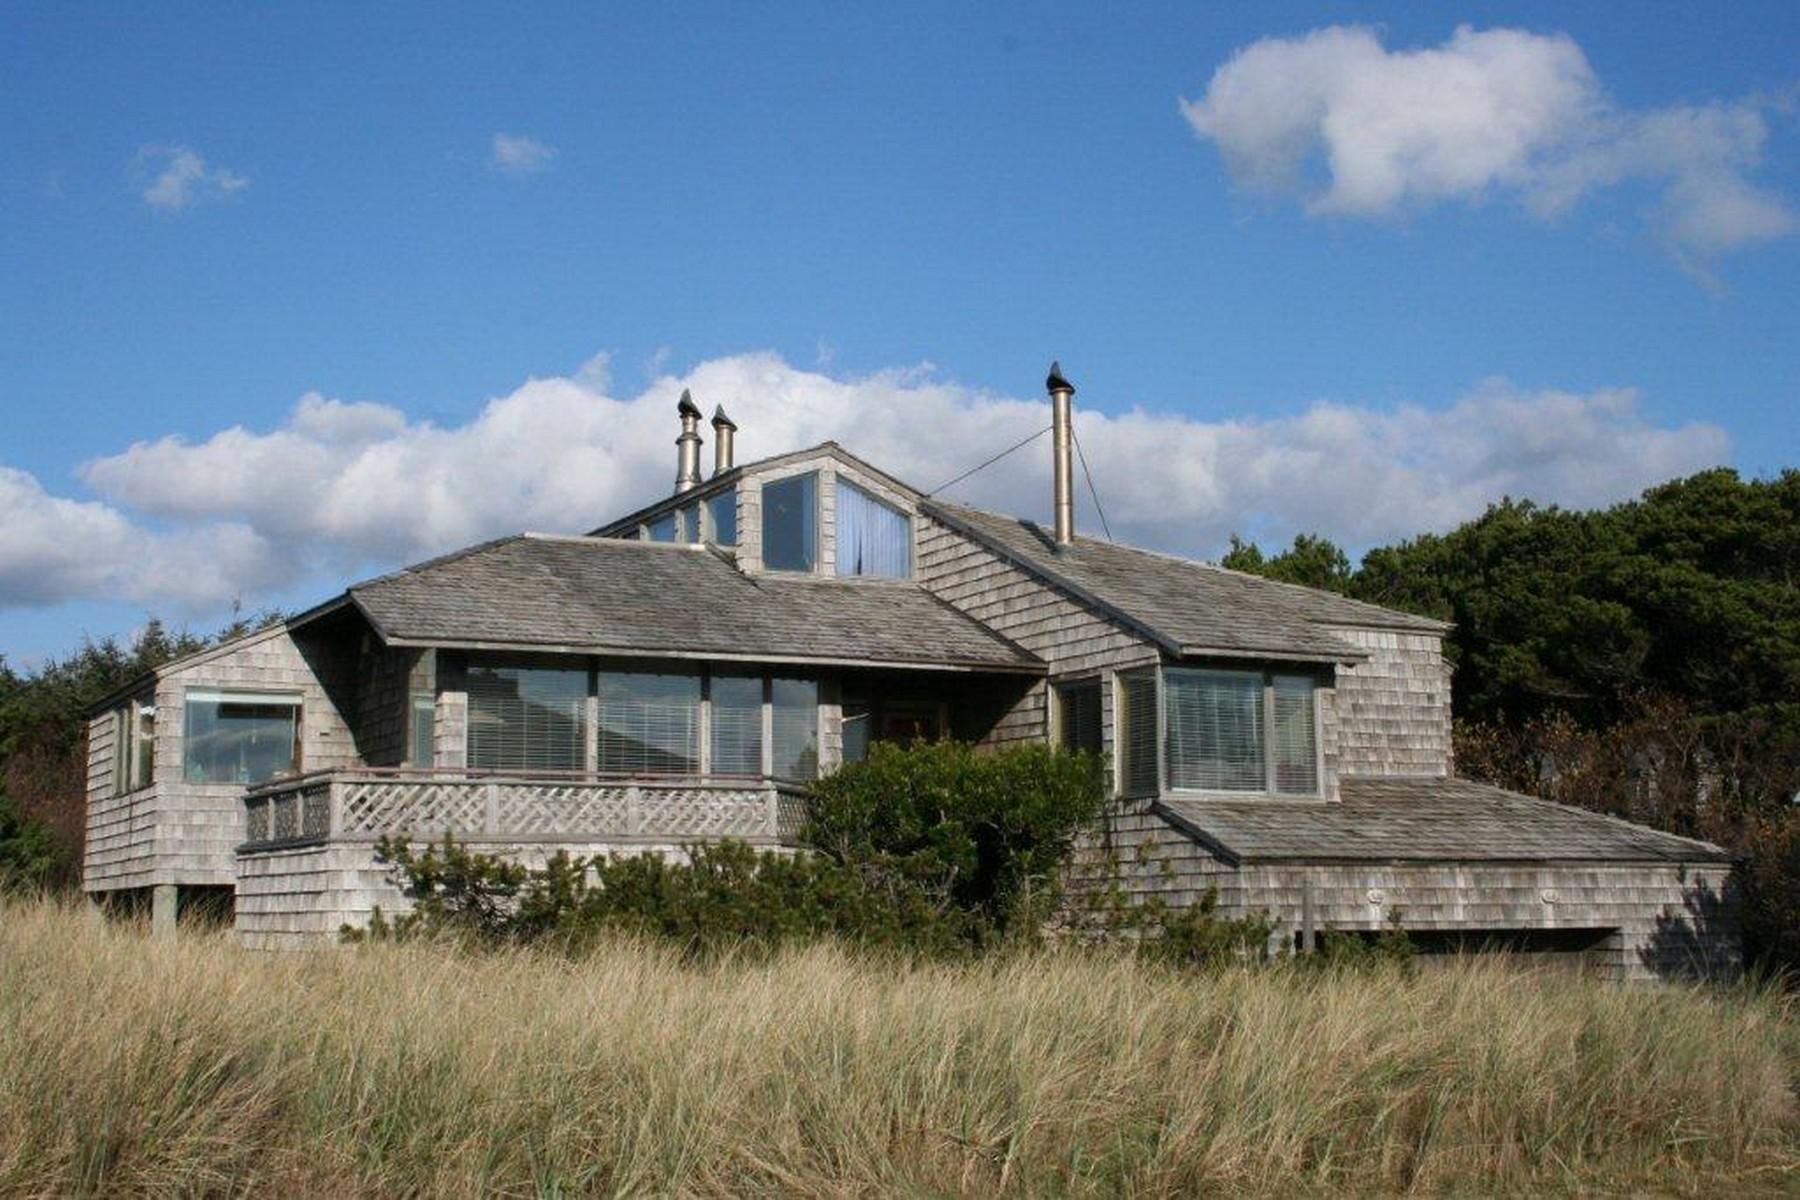 Single Family Home for Sale at Fabulous Ocean Views 8820 Pelican Ln. Manzanita, Oregon 97130 United States